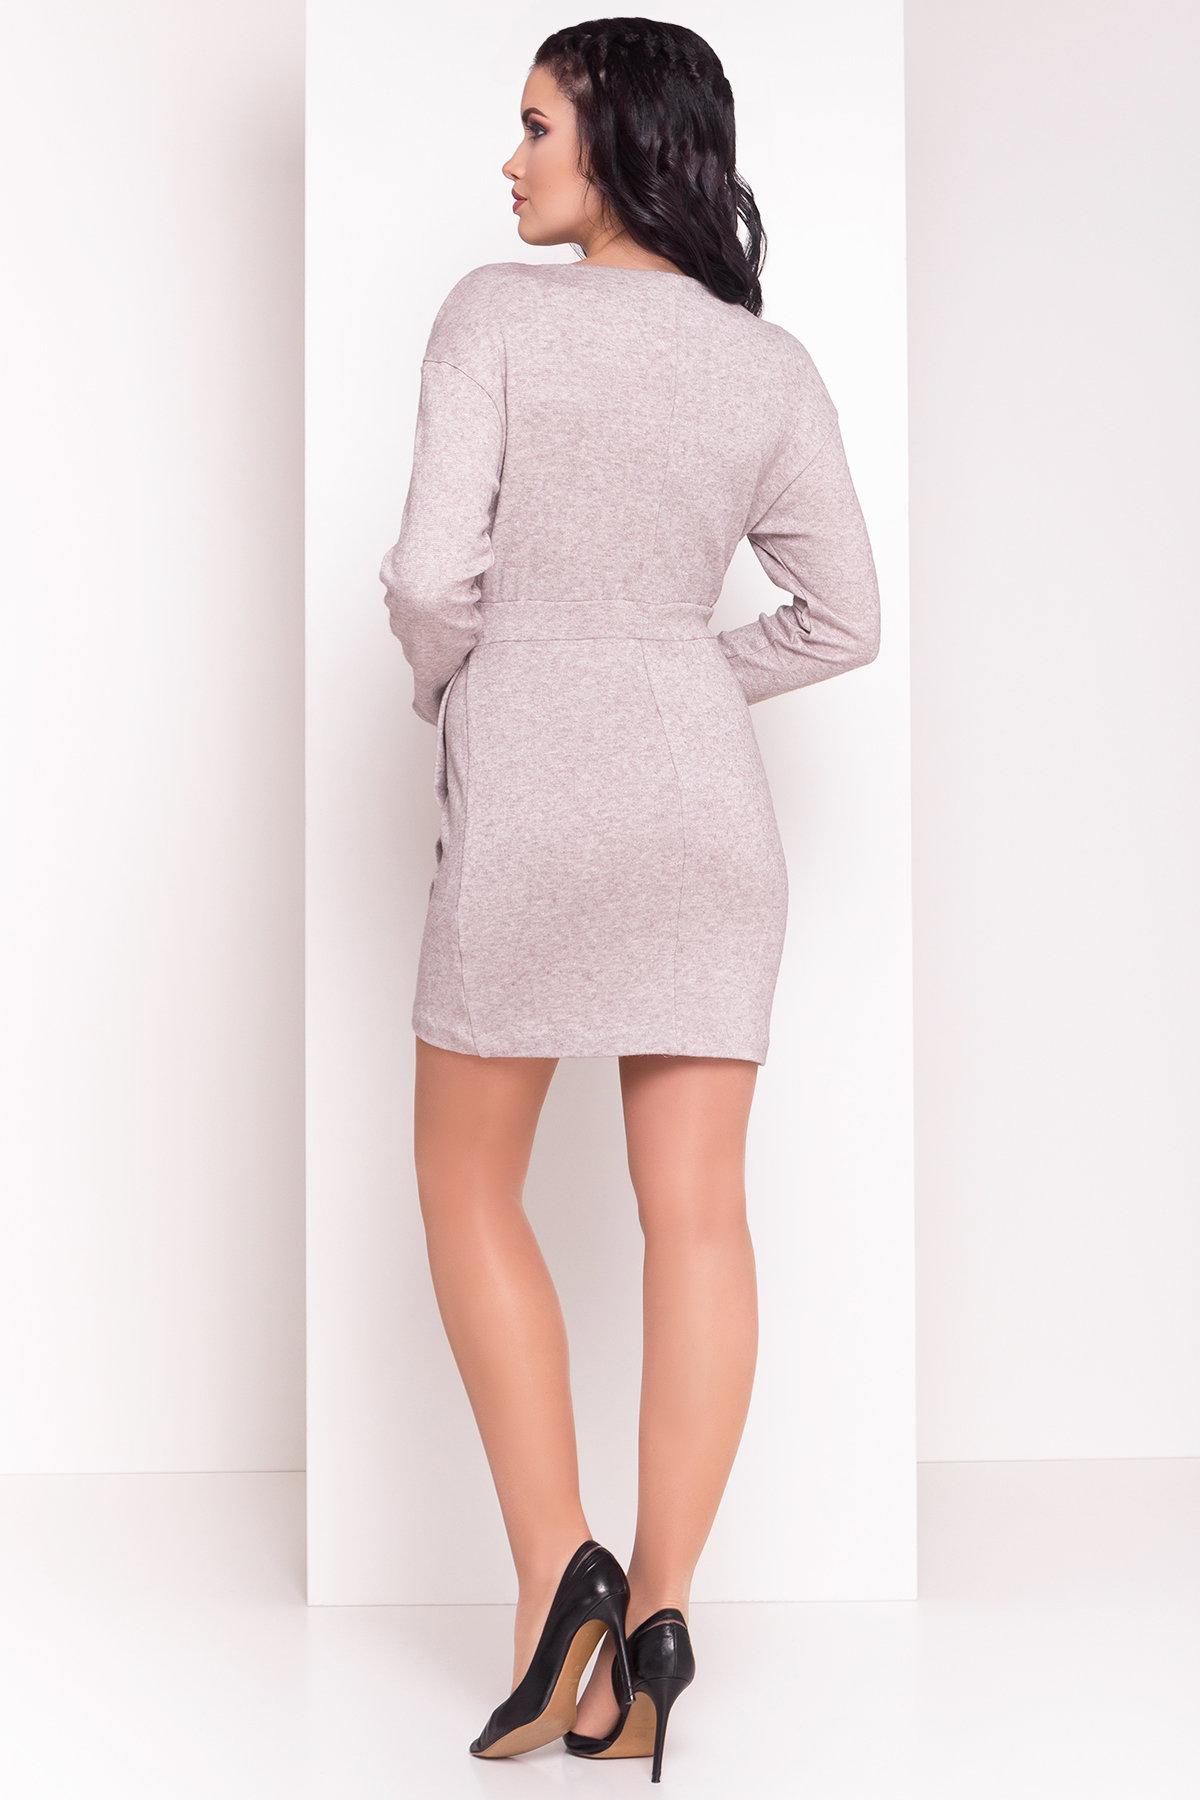 Платье Лайма 3870 Цвет: Бежевый